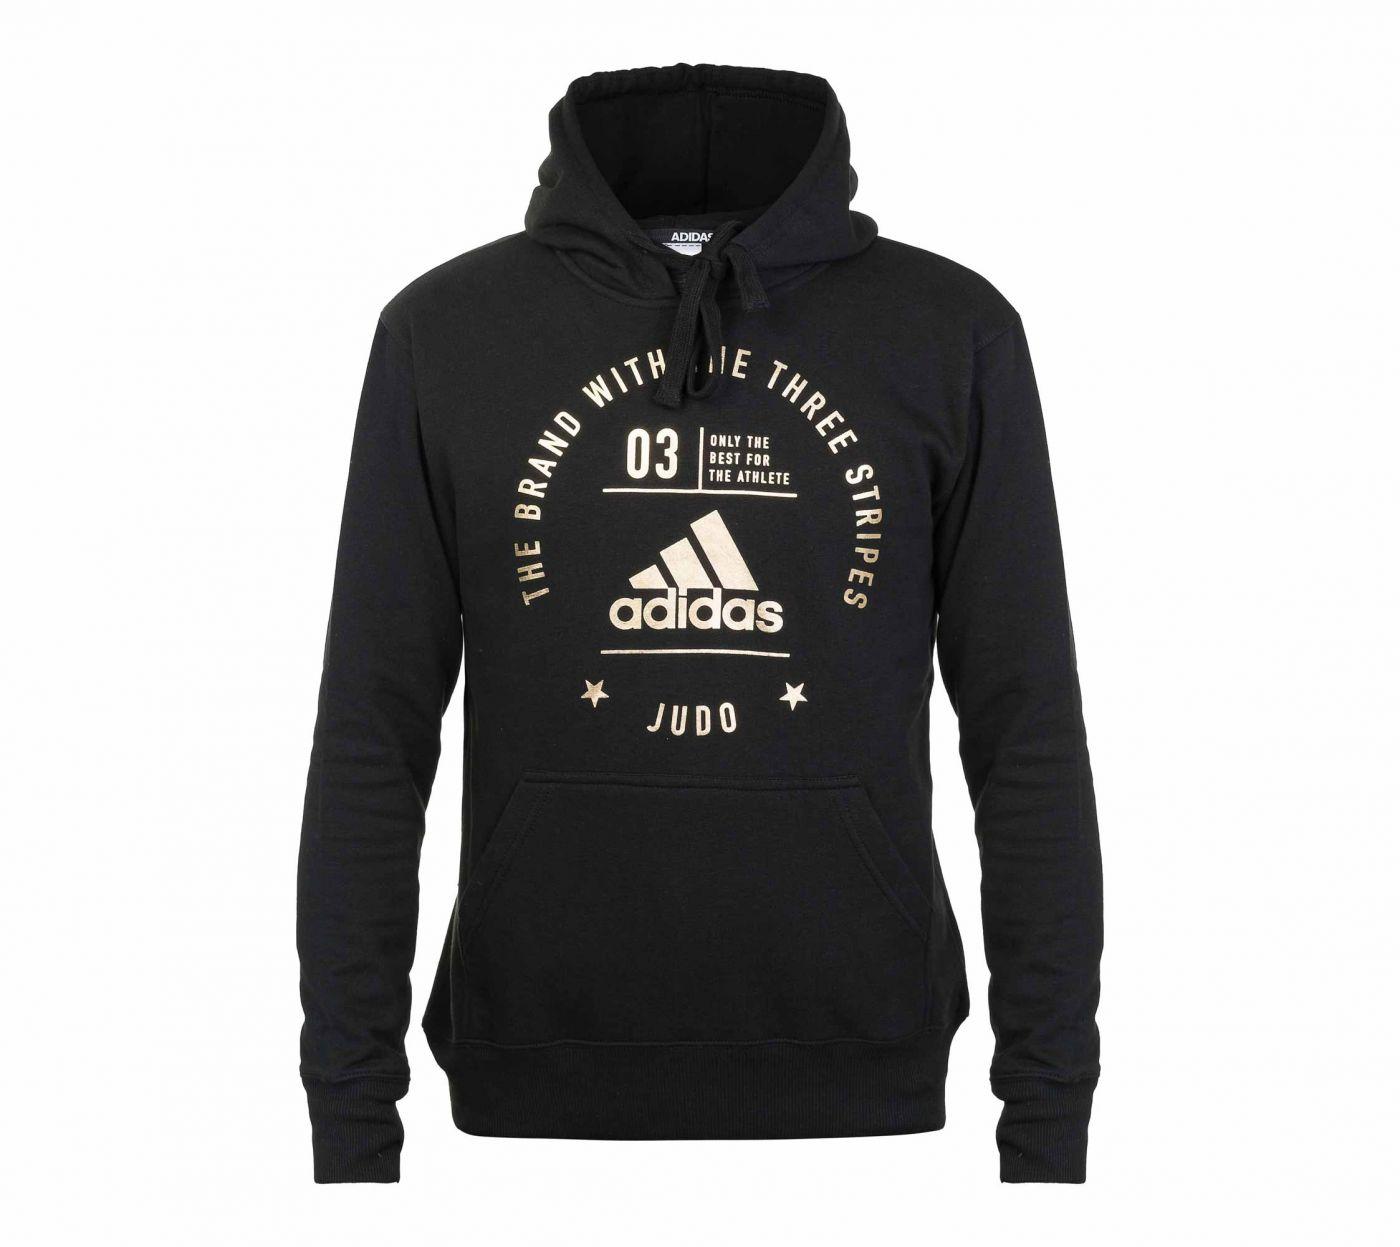 Толстовка Adidas с капюшоном (Худи) The Brand With The Three Stripes Judo черно-золотая, размер L, артикул adiCL02J